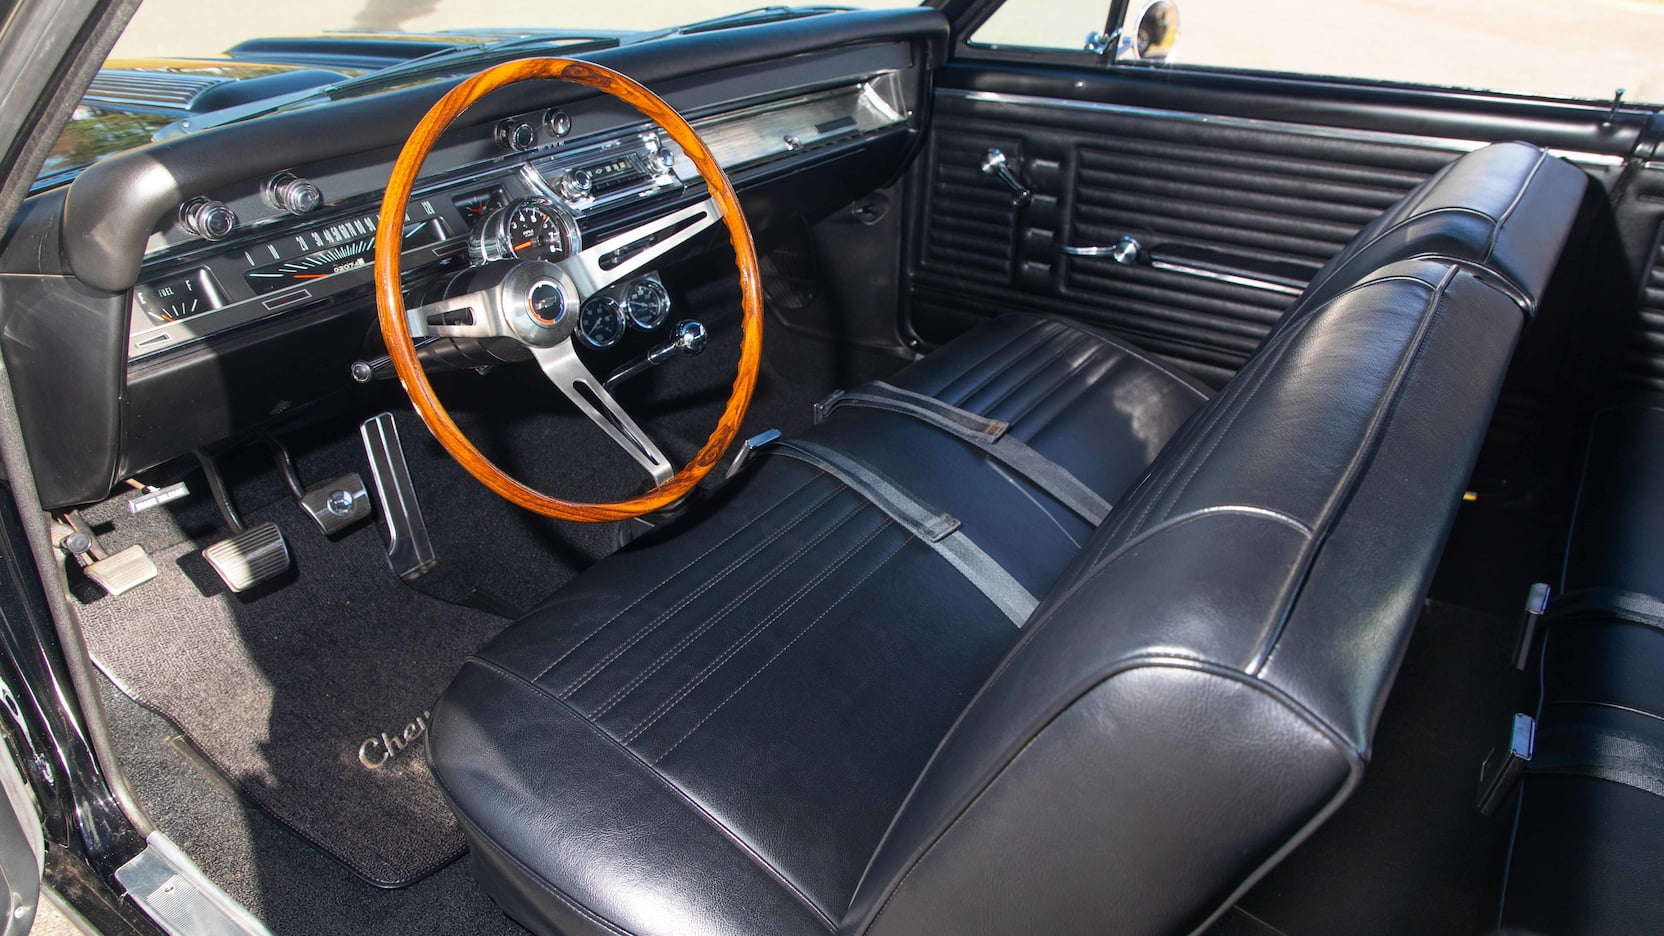 1967 Chevrolet Chevelle SS Interior